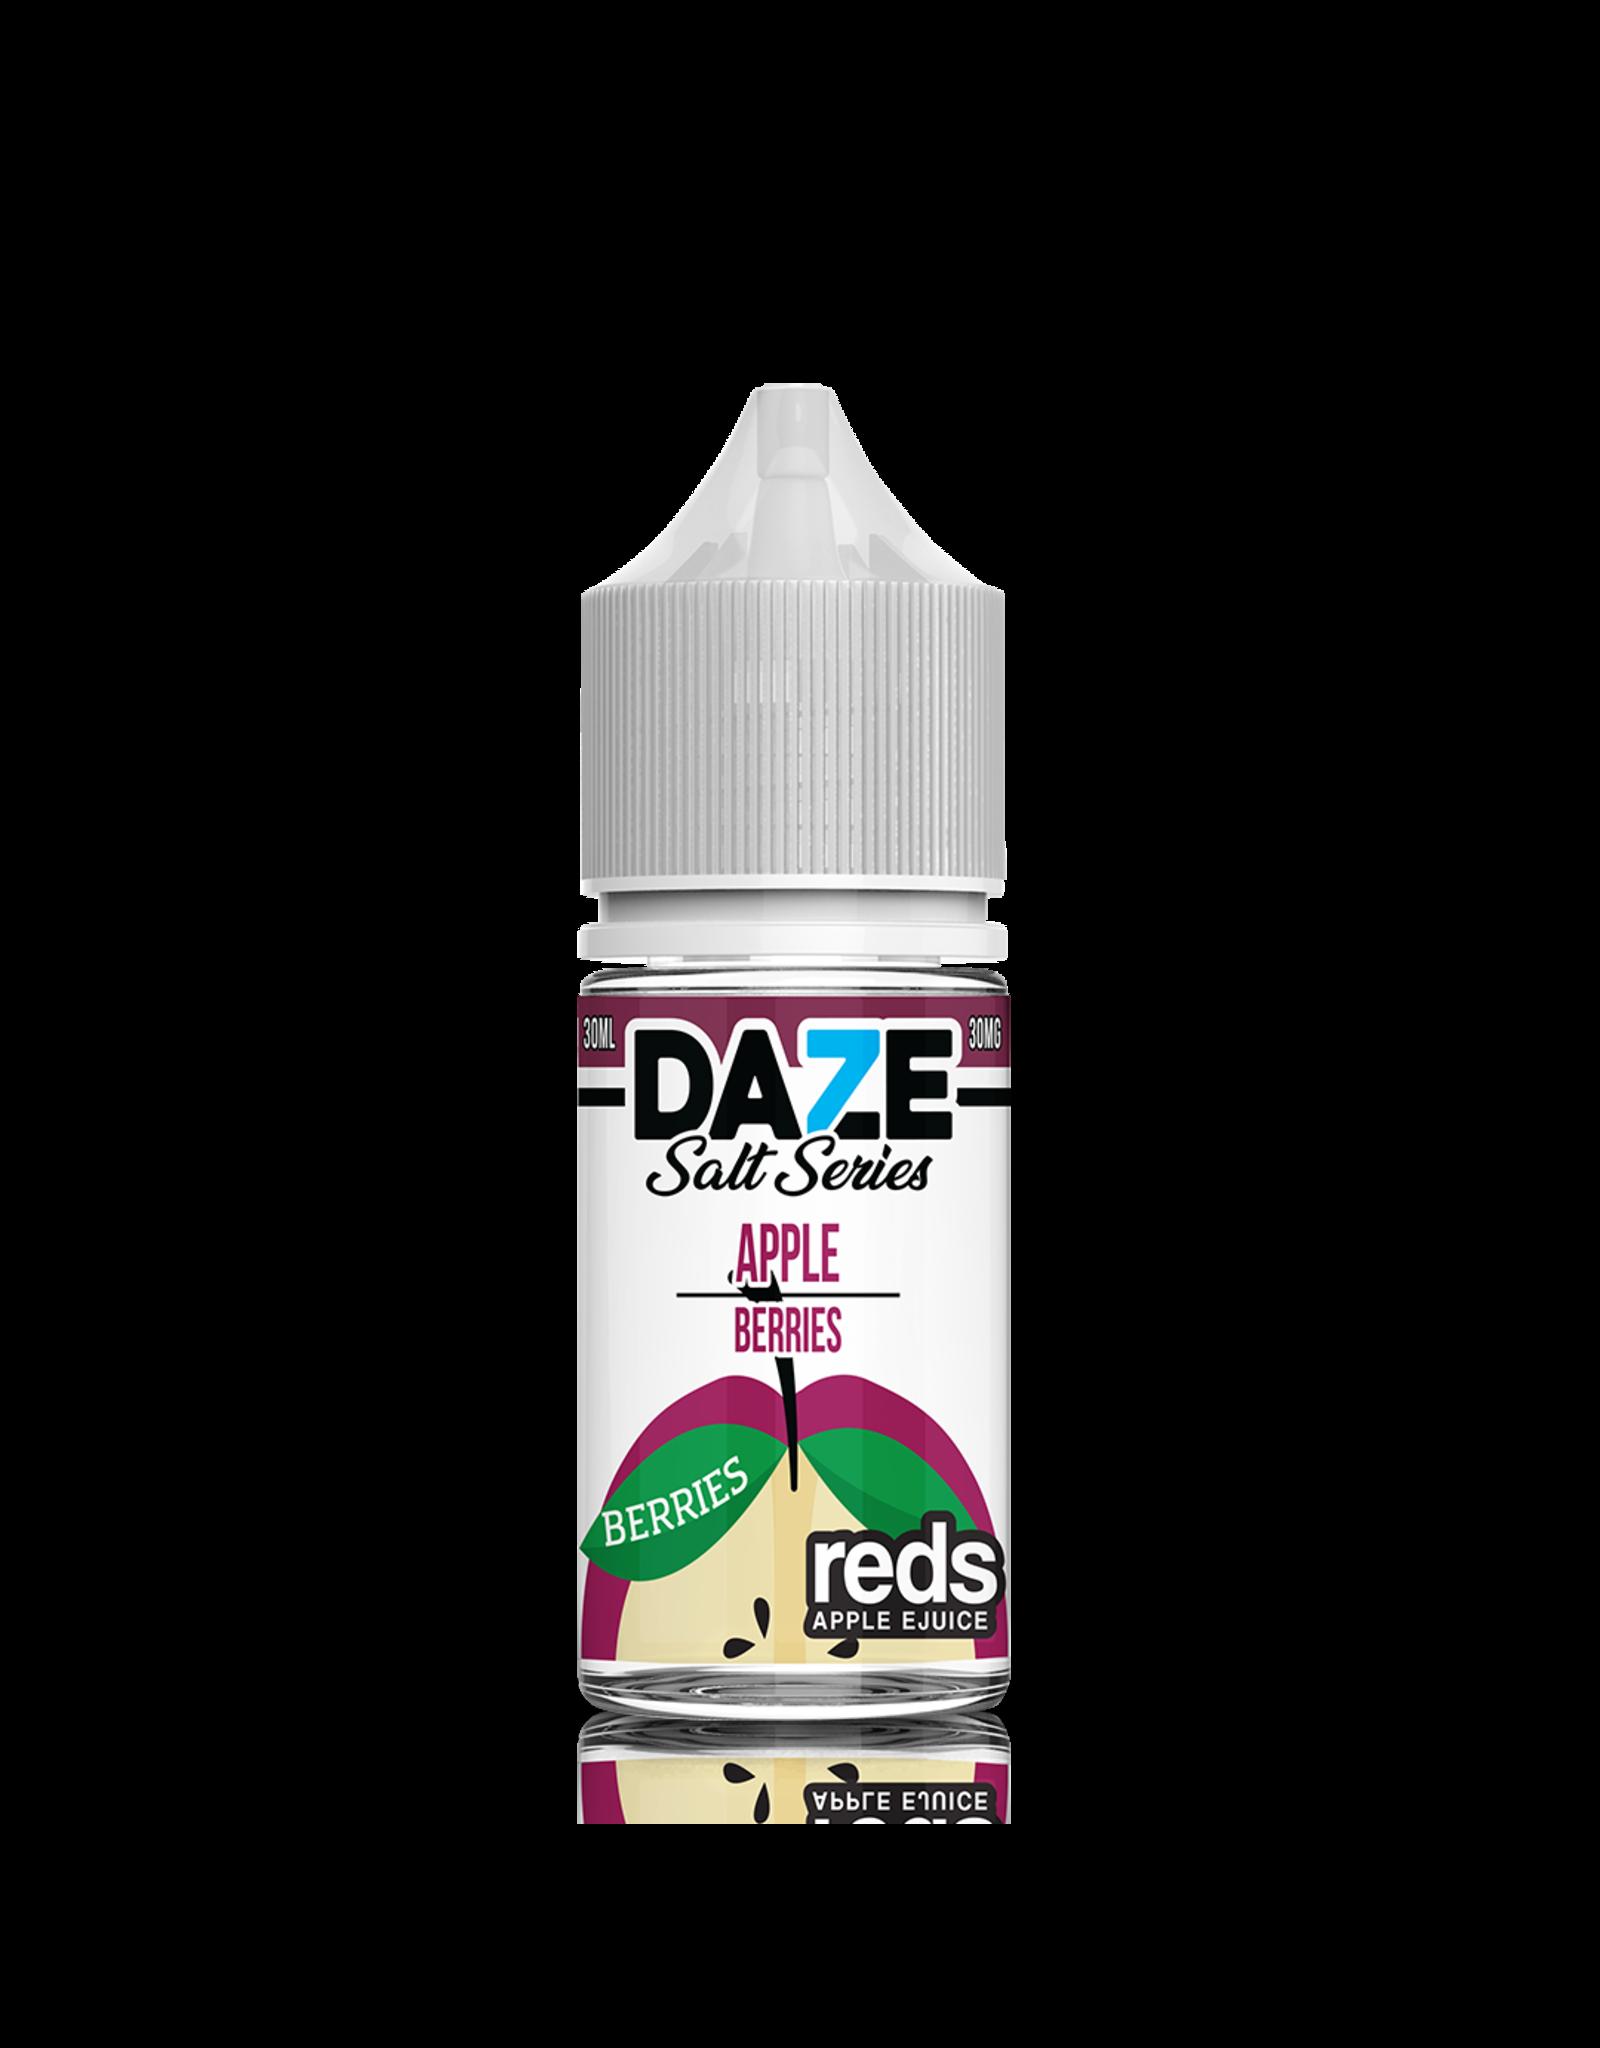 Vape 7 Daze (Reds Apple) Vape 7 Daze Salt